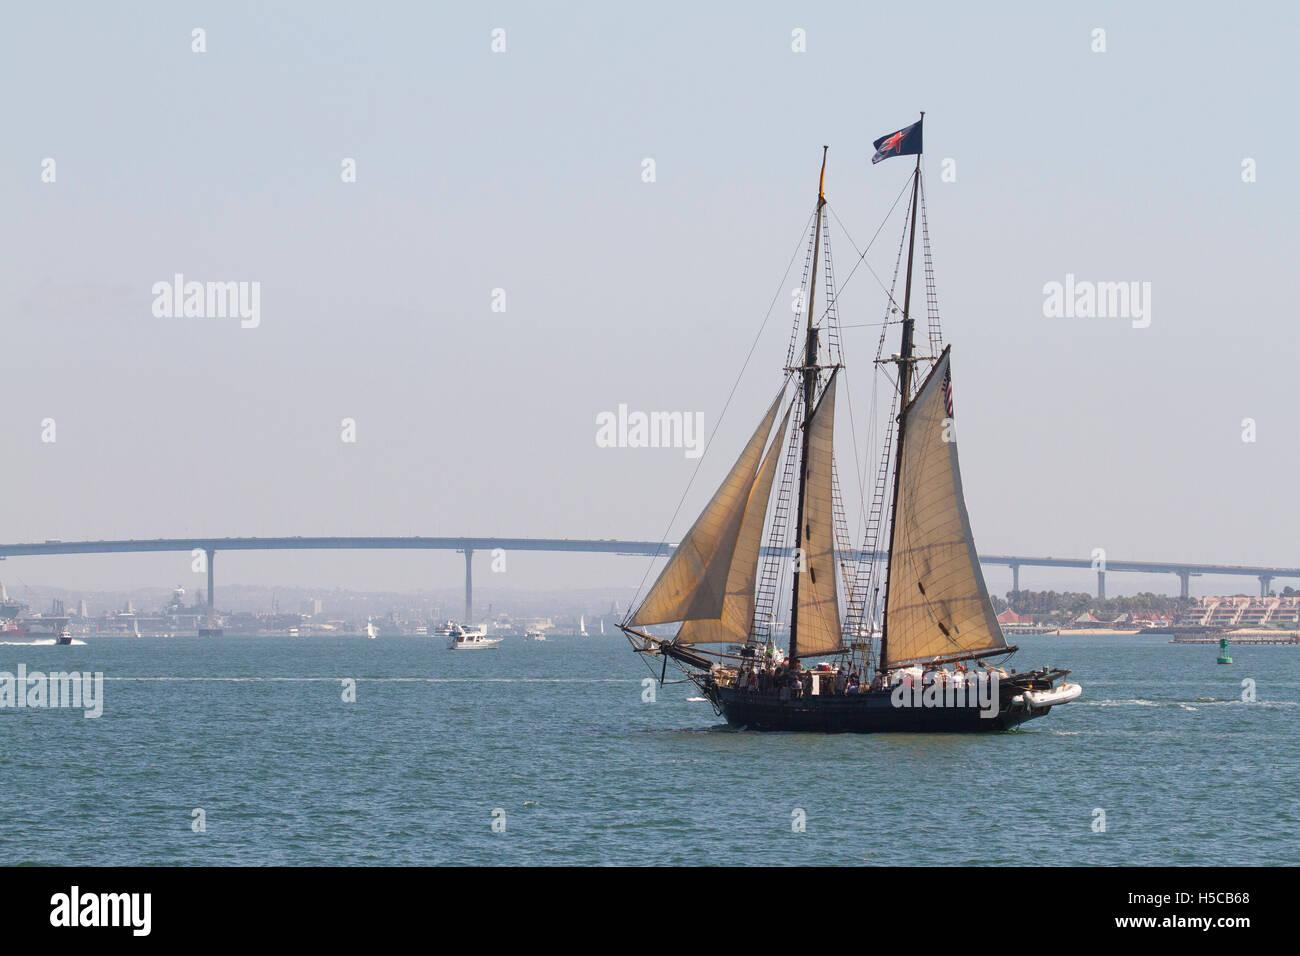 Tall ship Spirit of Dana Point in 2016 Festival of Sail, Parade of Ships, San Diego Bay, CA with Coronado Bridge - Stock Image